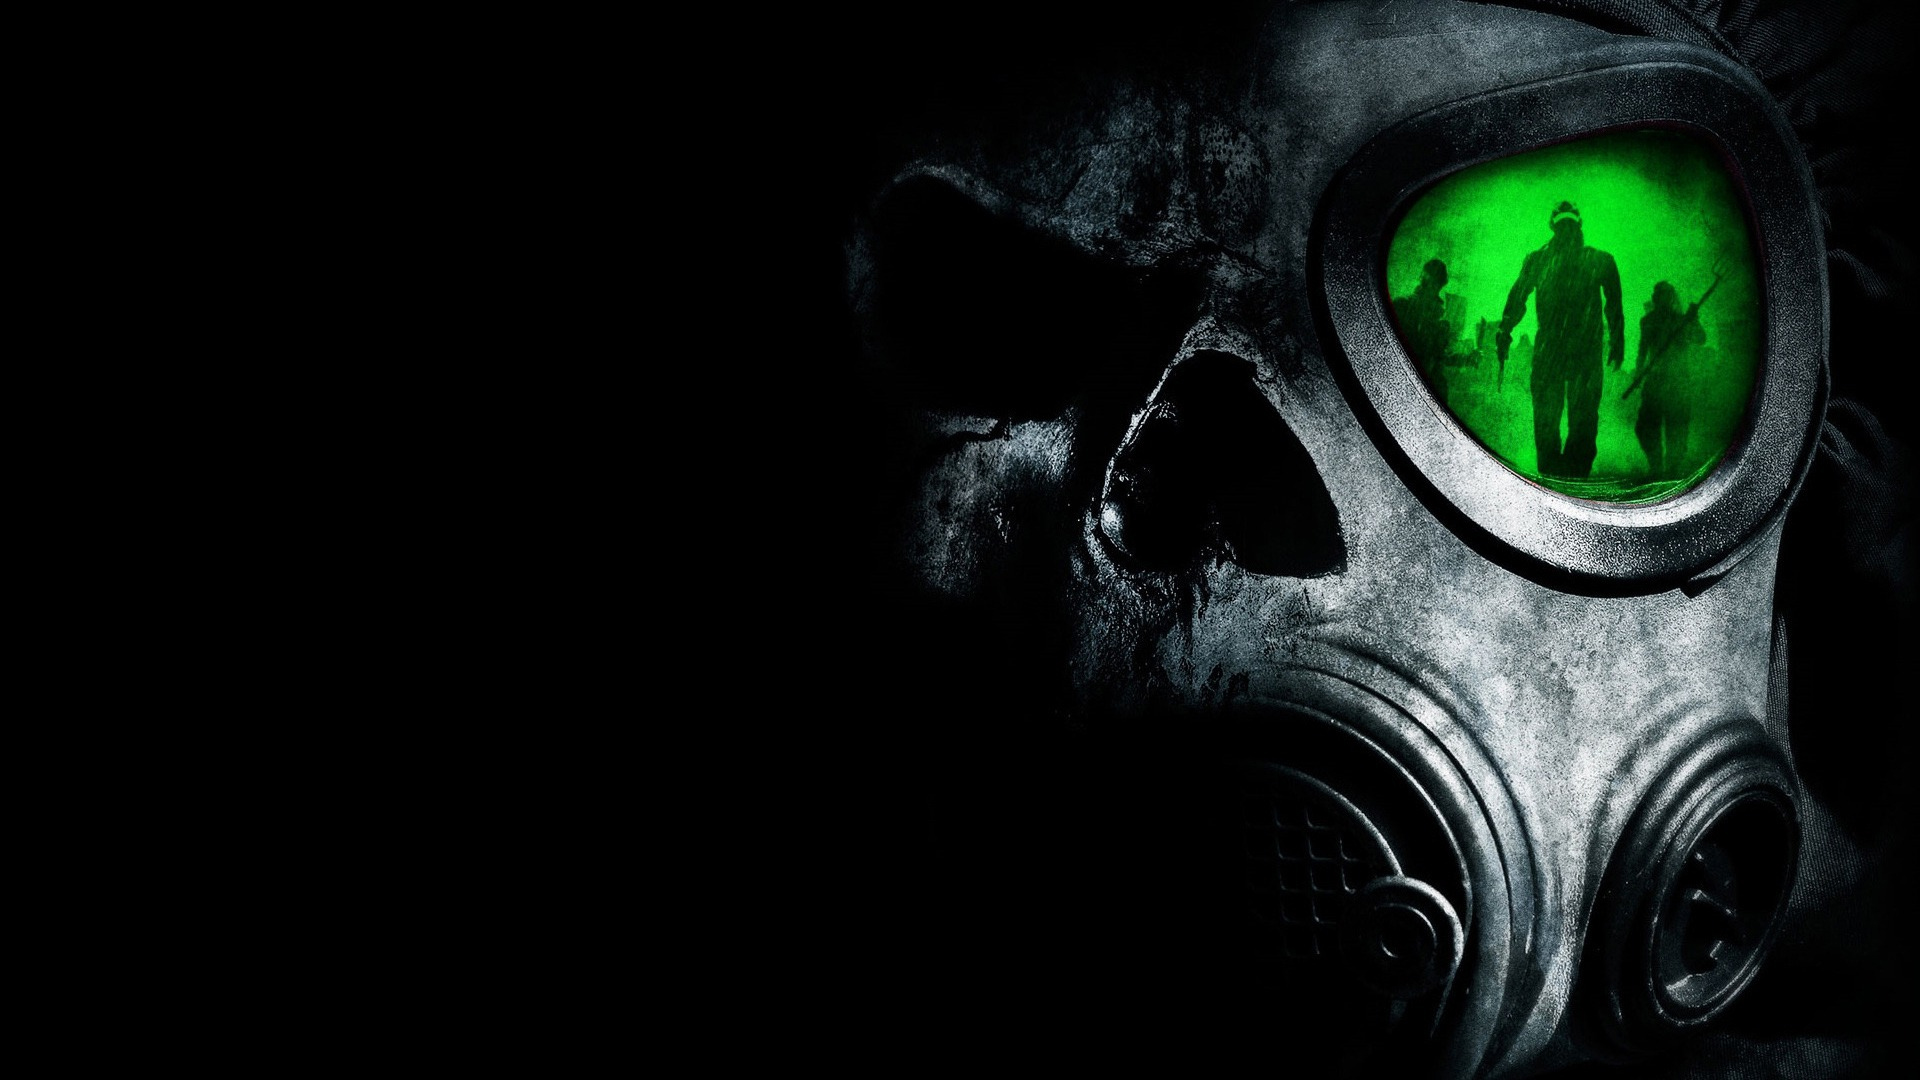 Skull Gas Mask HD Wallpaper Wallpaper 1920x1080